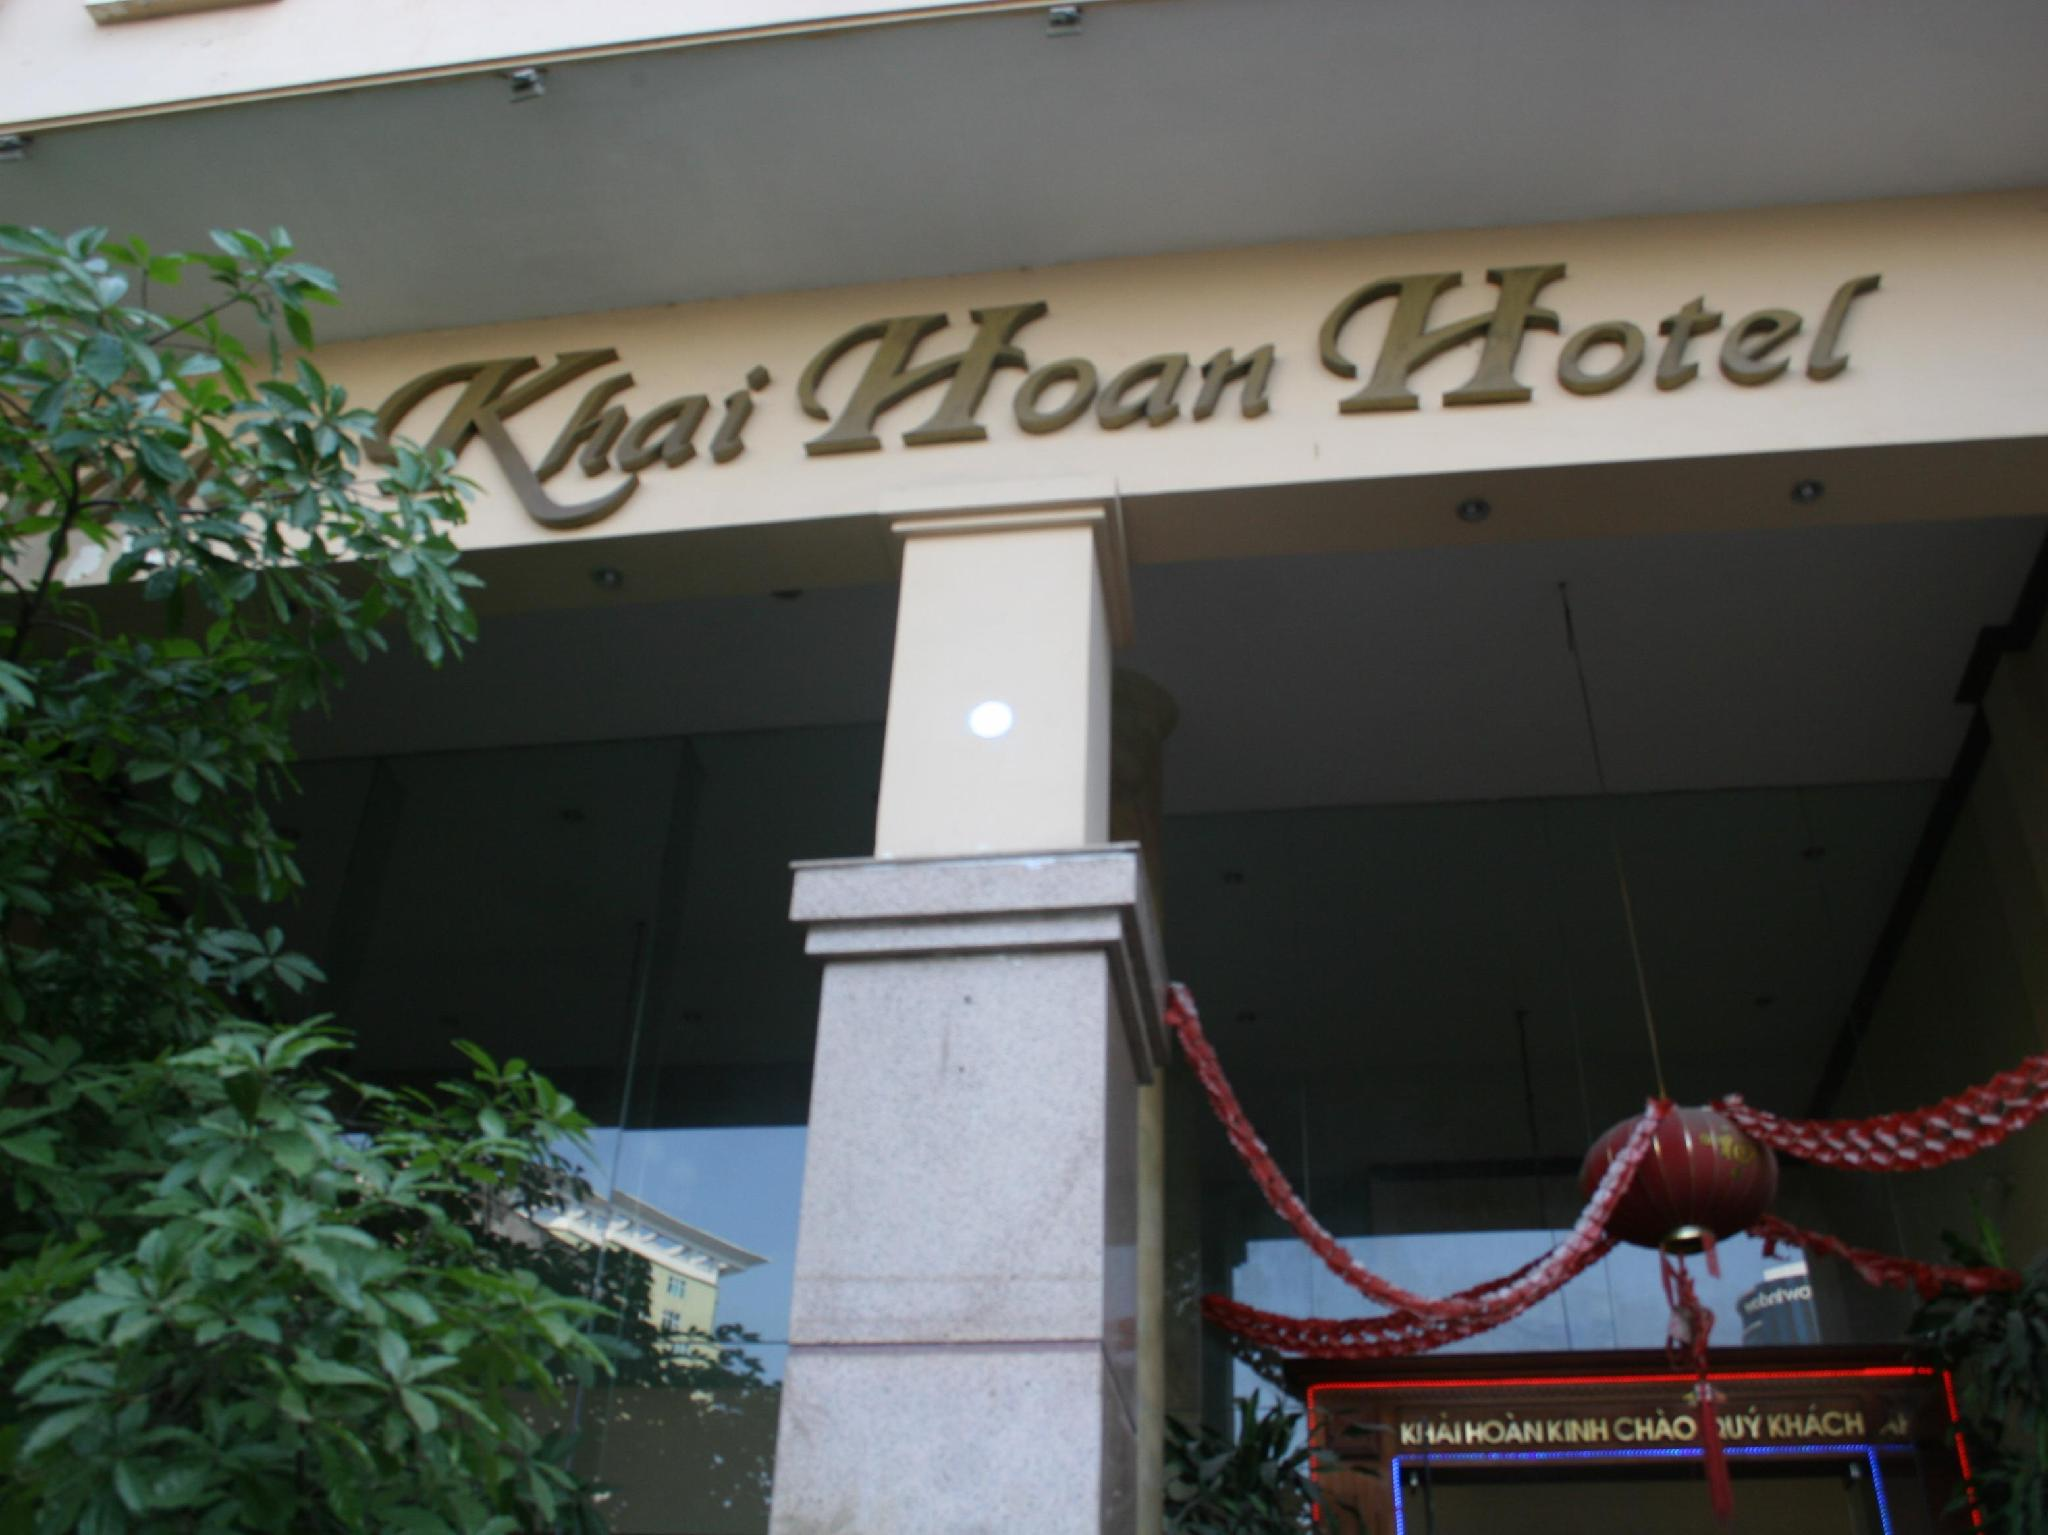 Hanoi Khai Hoan Hotel - Hotell och Boende i Vietnam , Hanoi